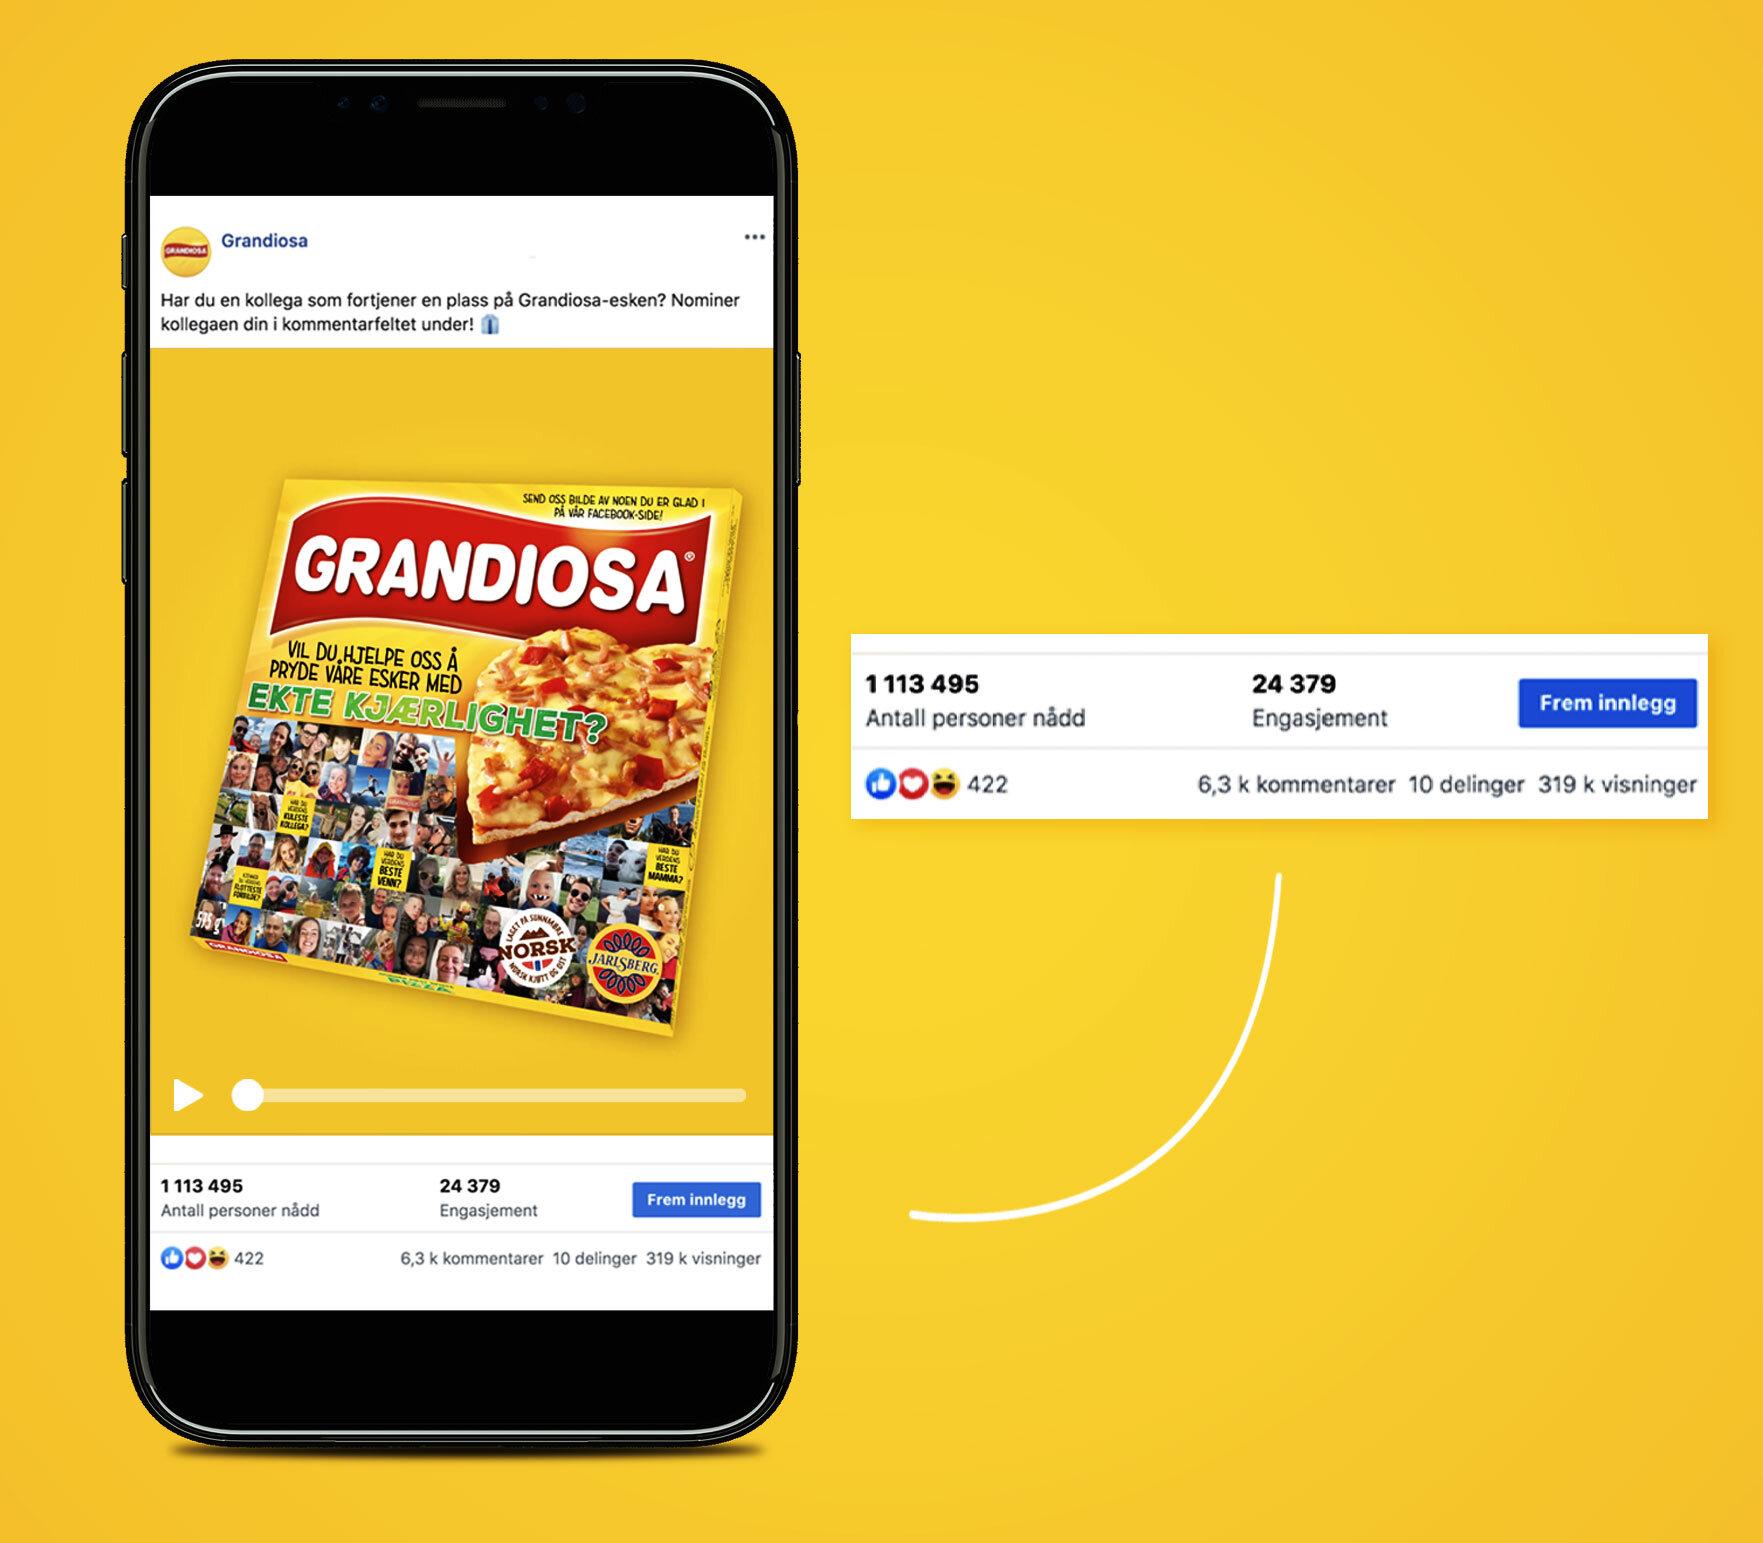 Grandiosa_Case_phone_results_3.jpg